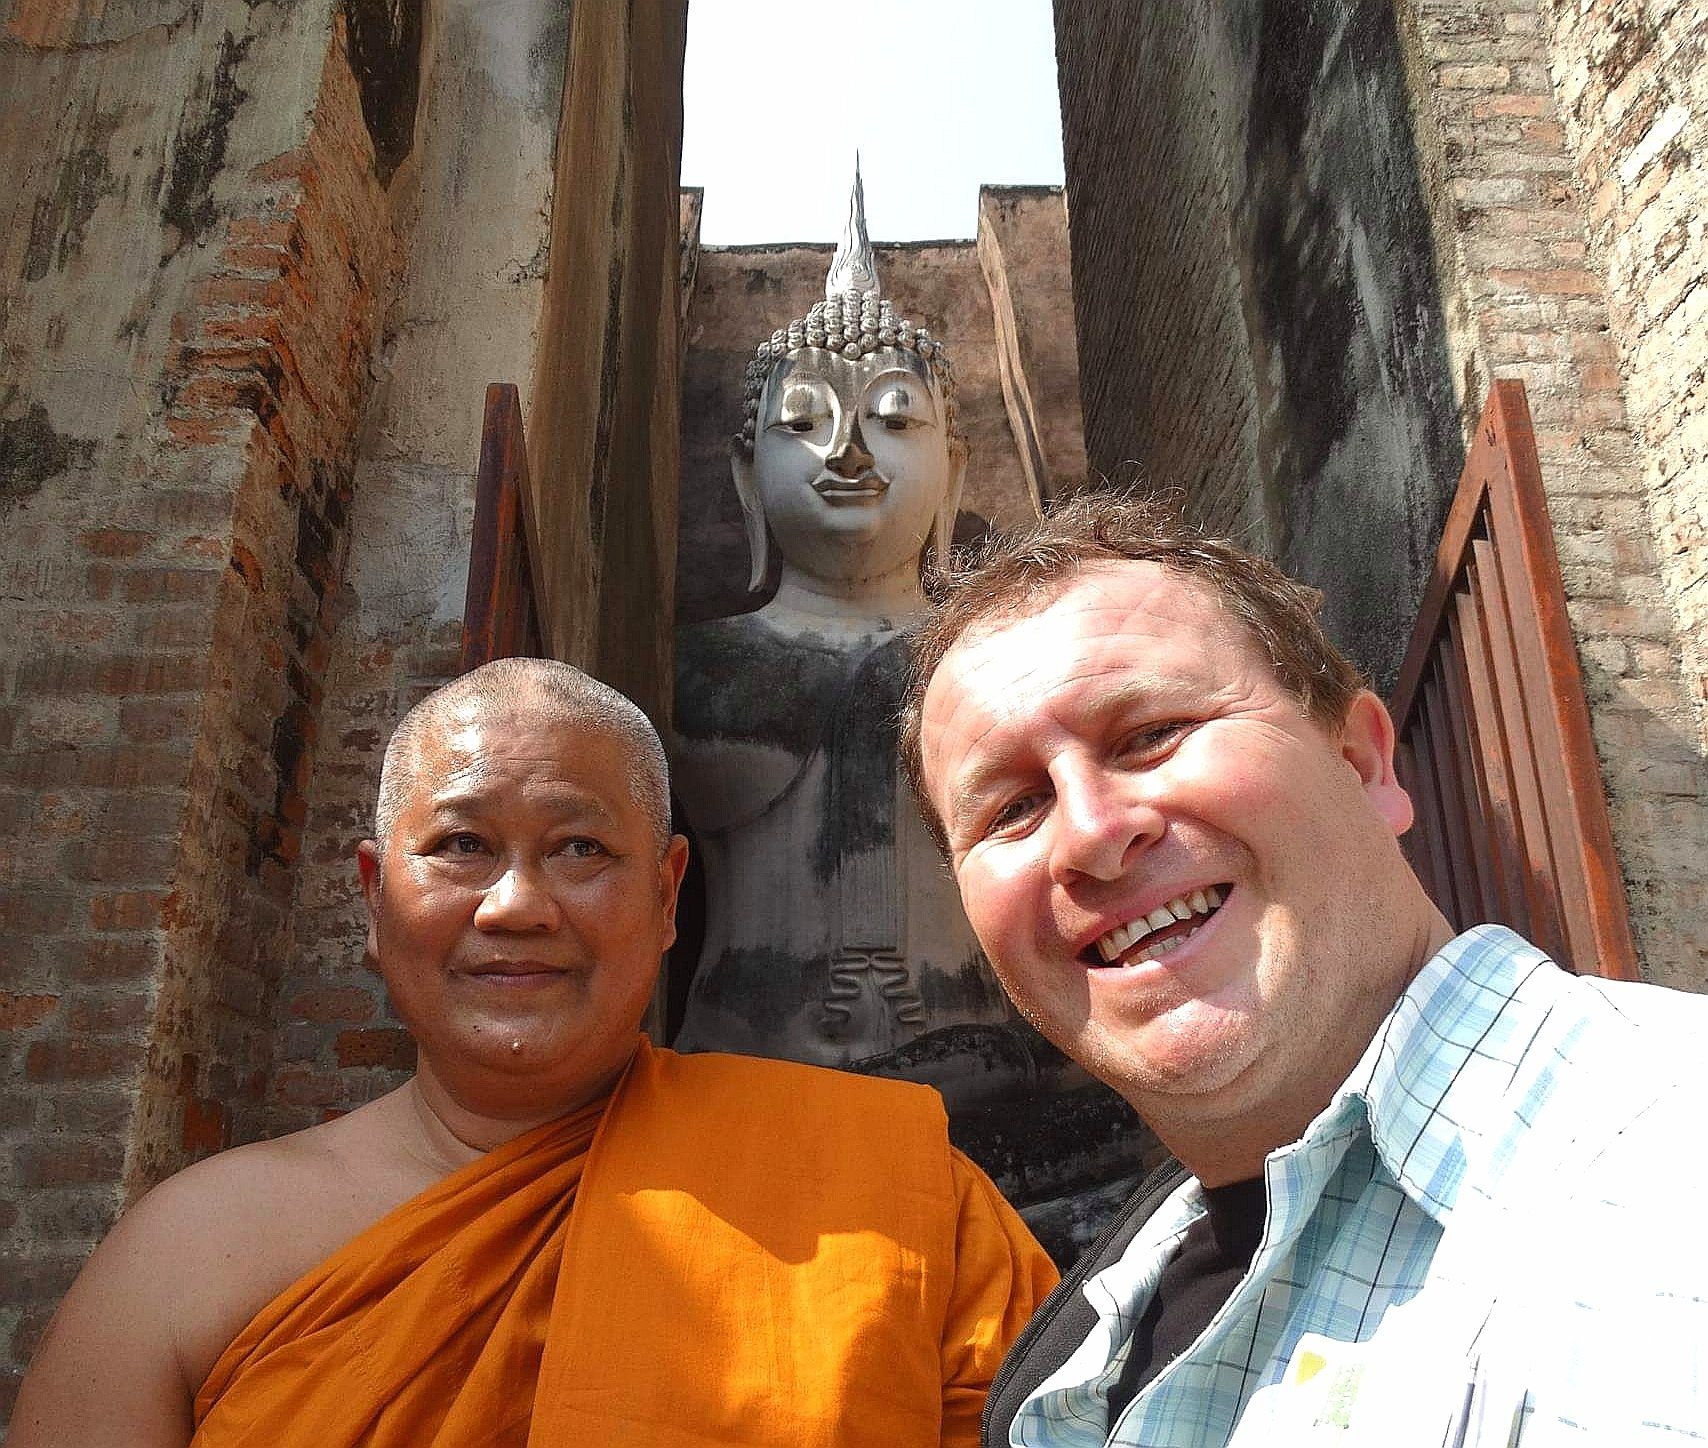 Sukhothai, Thailand. Enigmatic Wat Si Chum temple